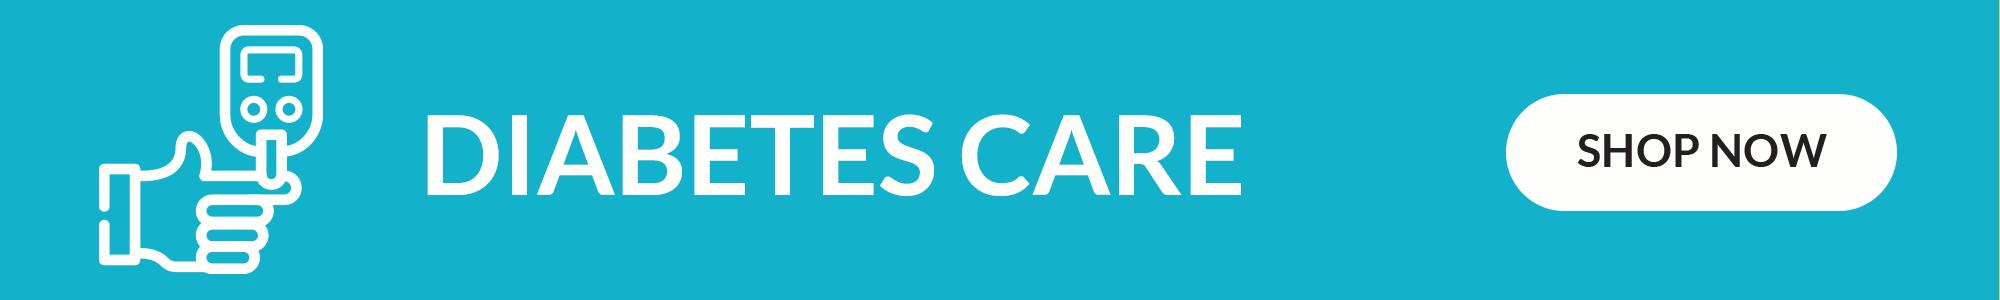 diabetes-care-header.png